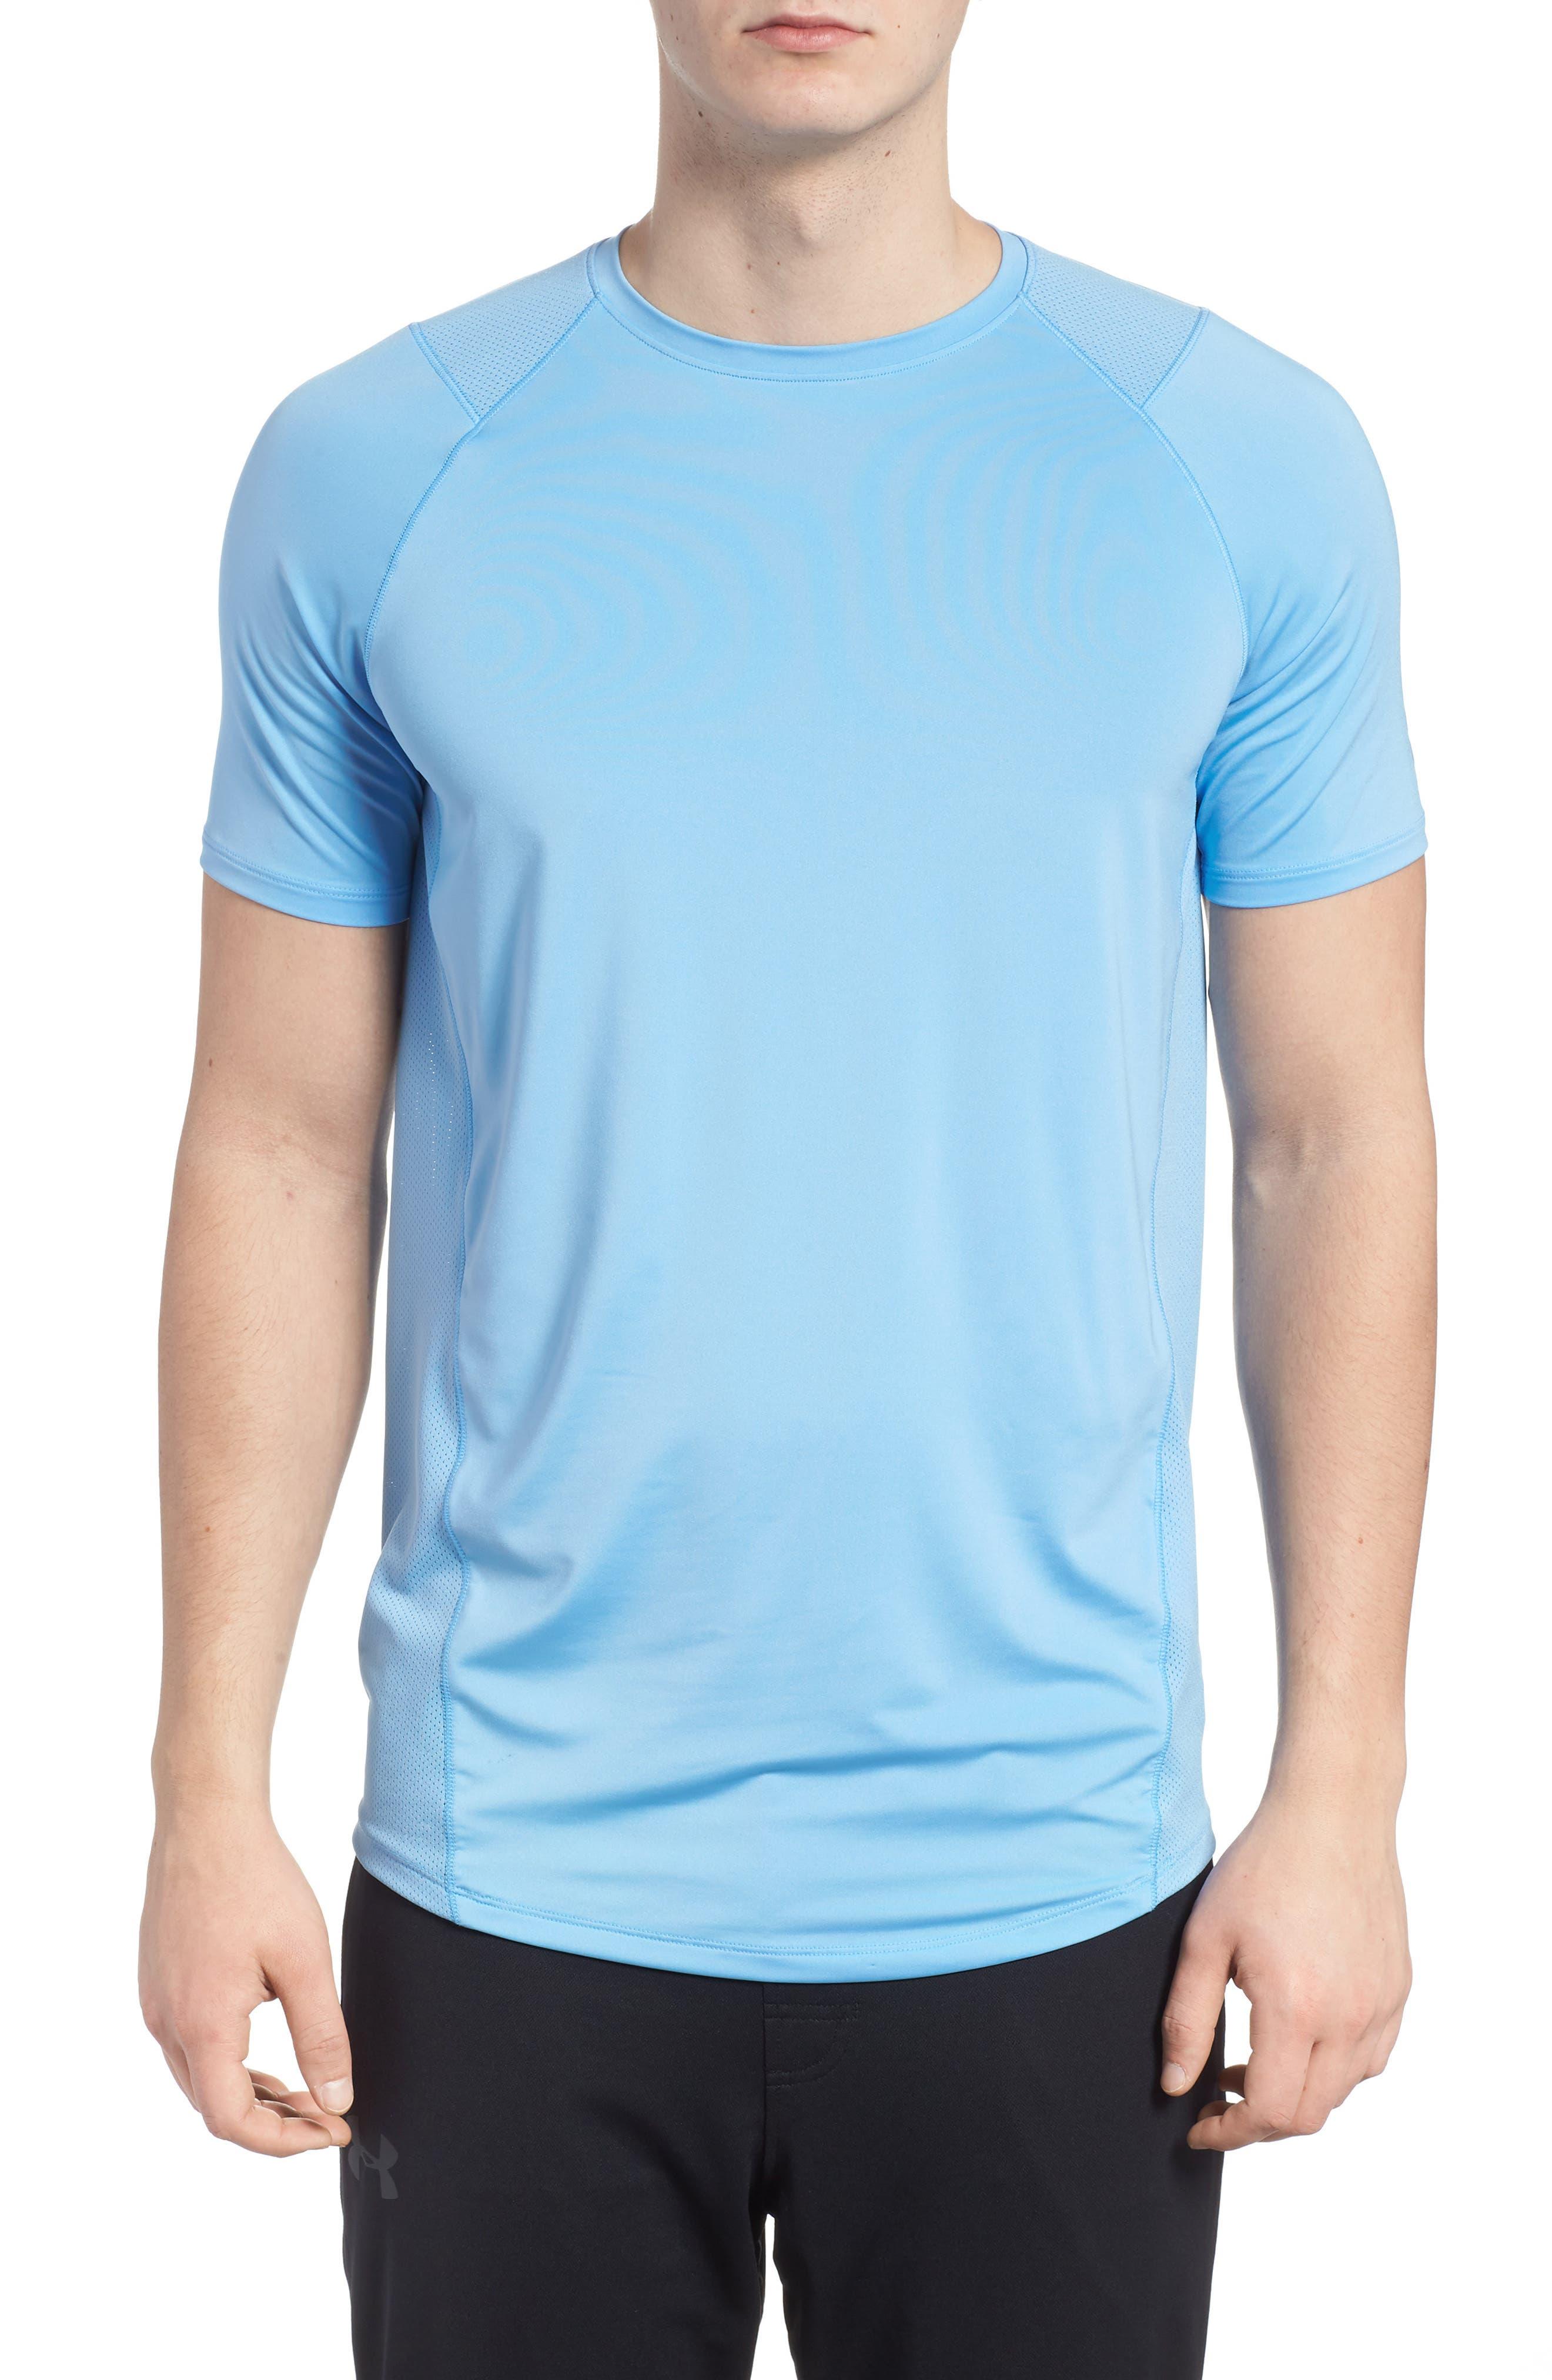 Raid 2.0 Crewneck T-Shirt,                         Main,                         color, Carolina Blue/ Steel